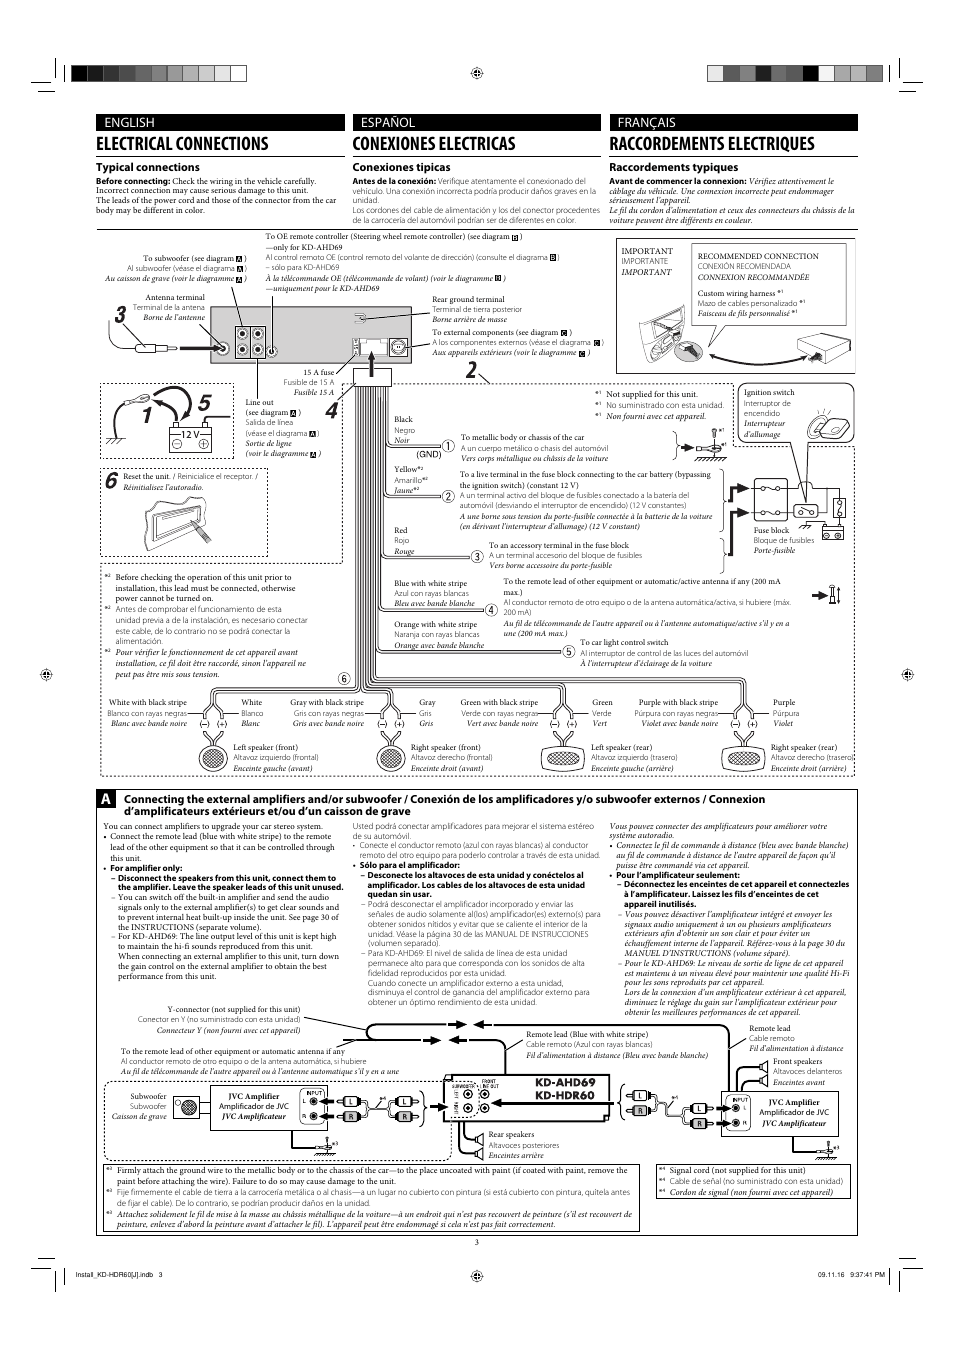 Modern Car Stereo Jvc Kd Hdr60 Wiring Diagram Photo - Wiring Diagram ...